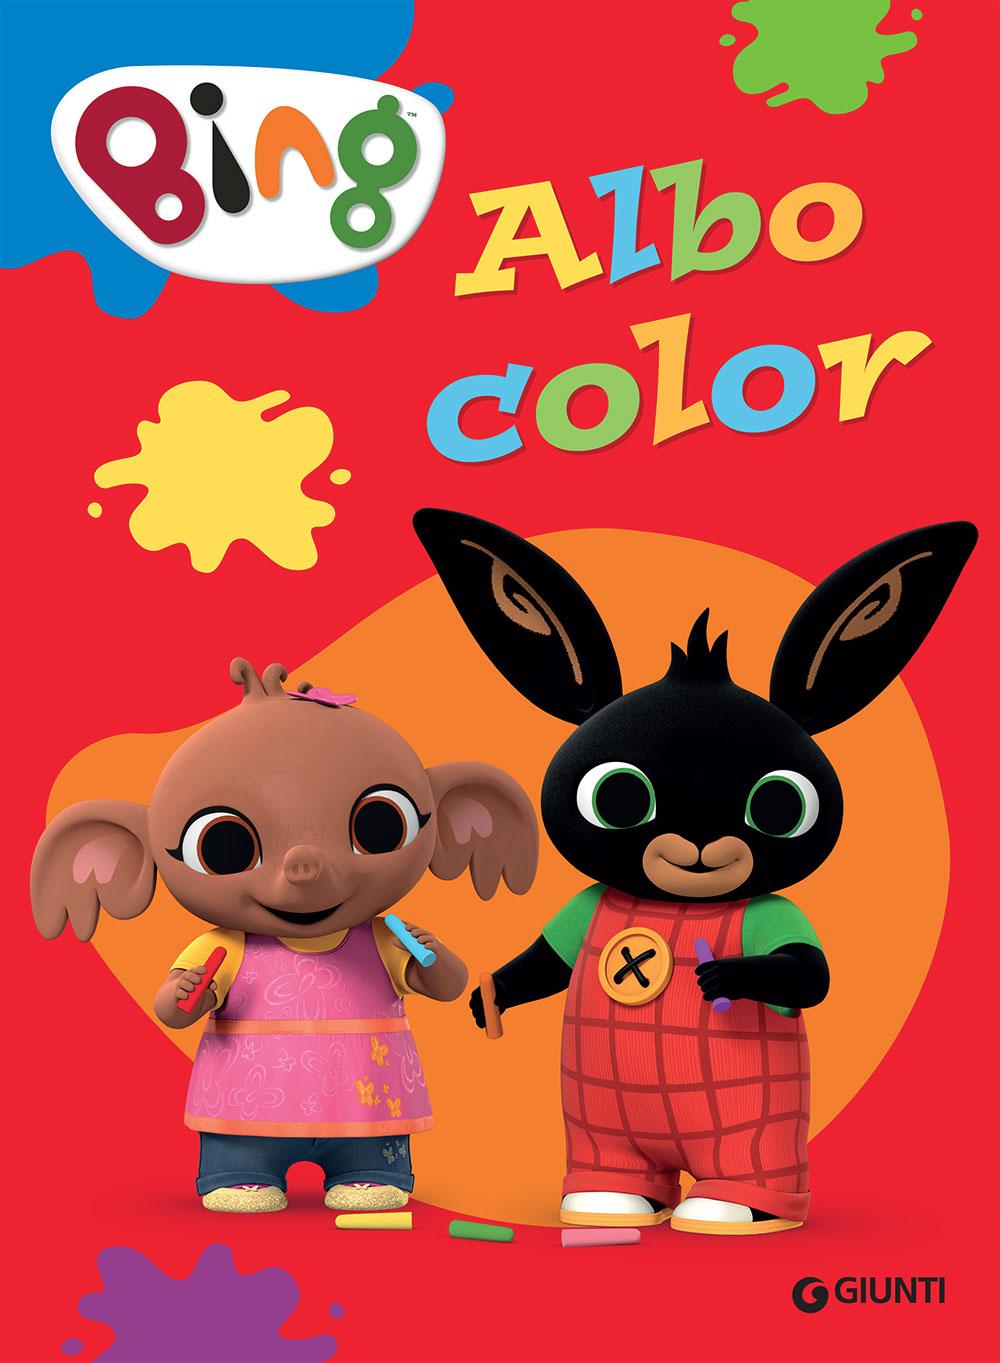 Bing - Albo color